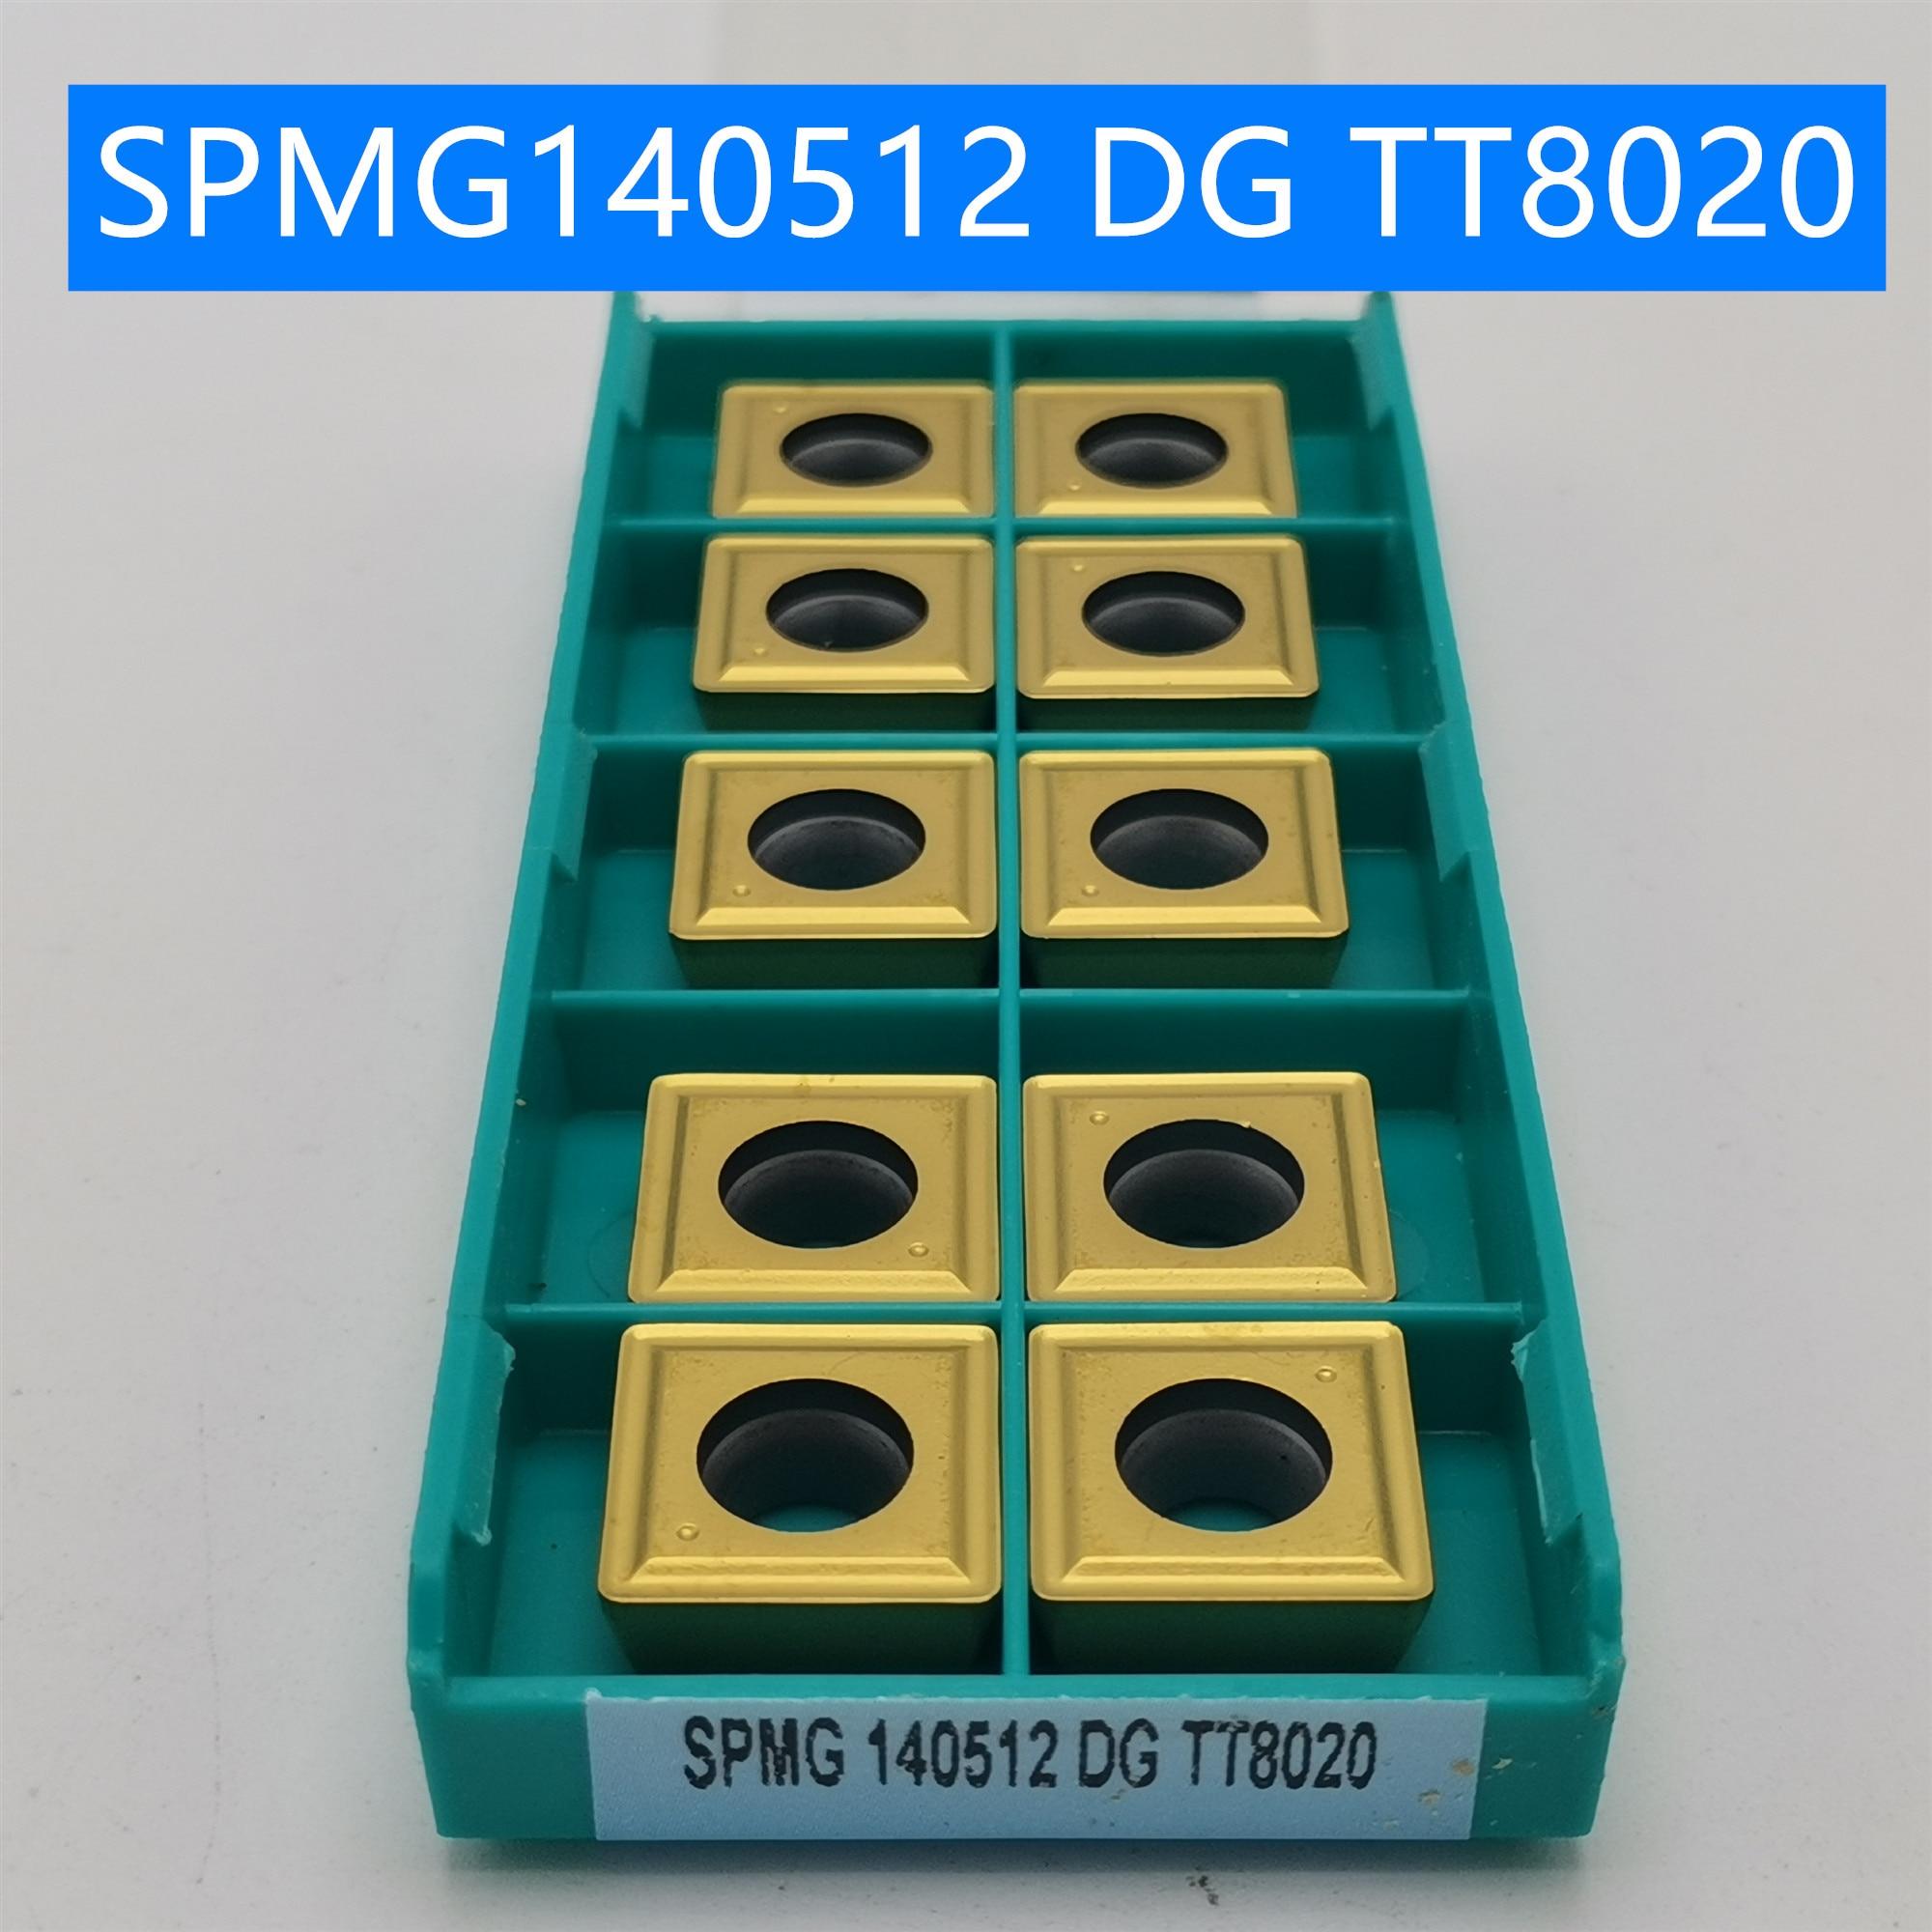 SPMG050204 SPMG060204 SPMG07T308 SPMG090408 SPMG110408 SPMG140520 DG TT9030  TT8020 Carbide Insert Turning Tool Lathe Cutter